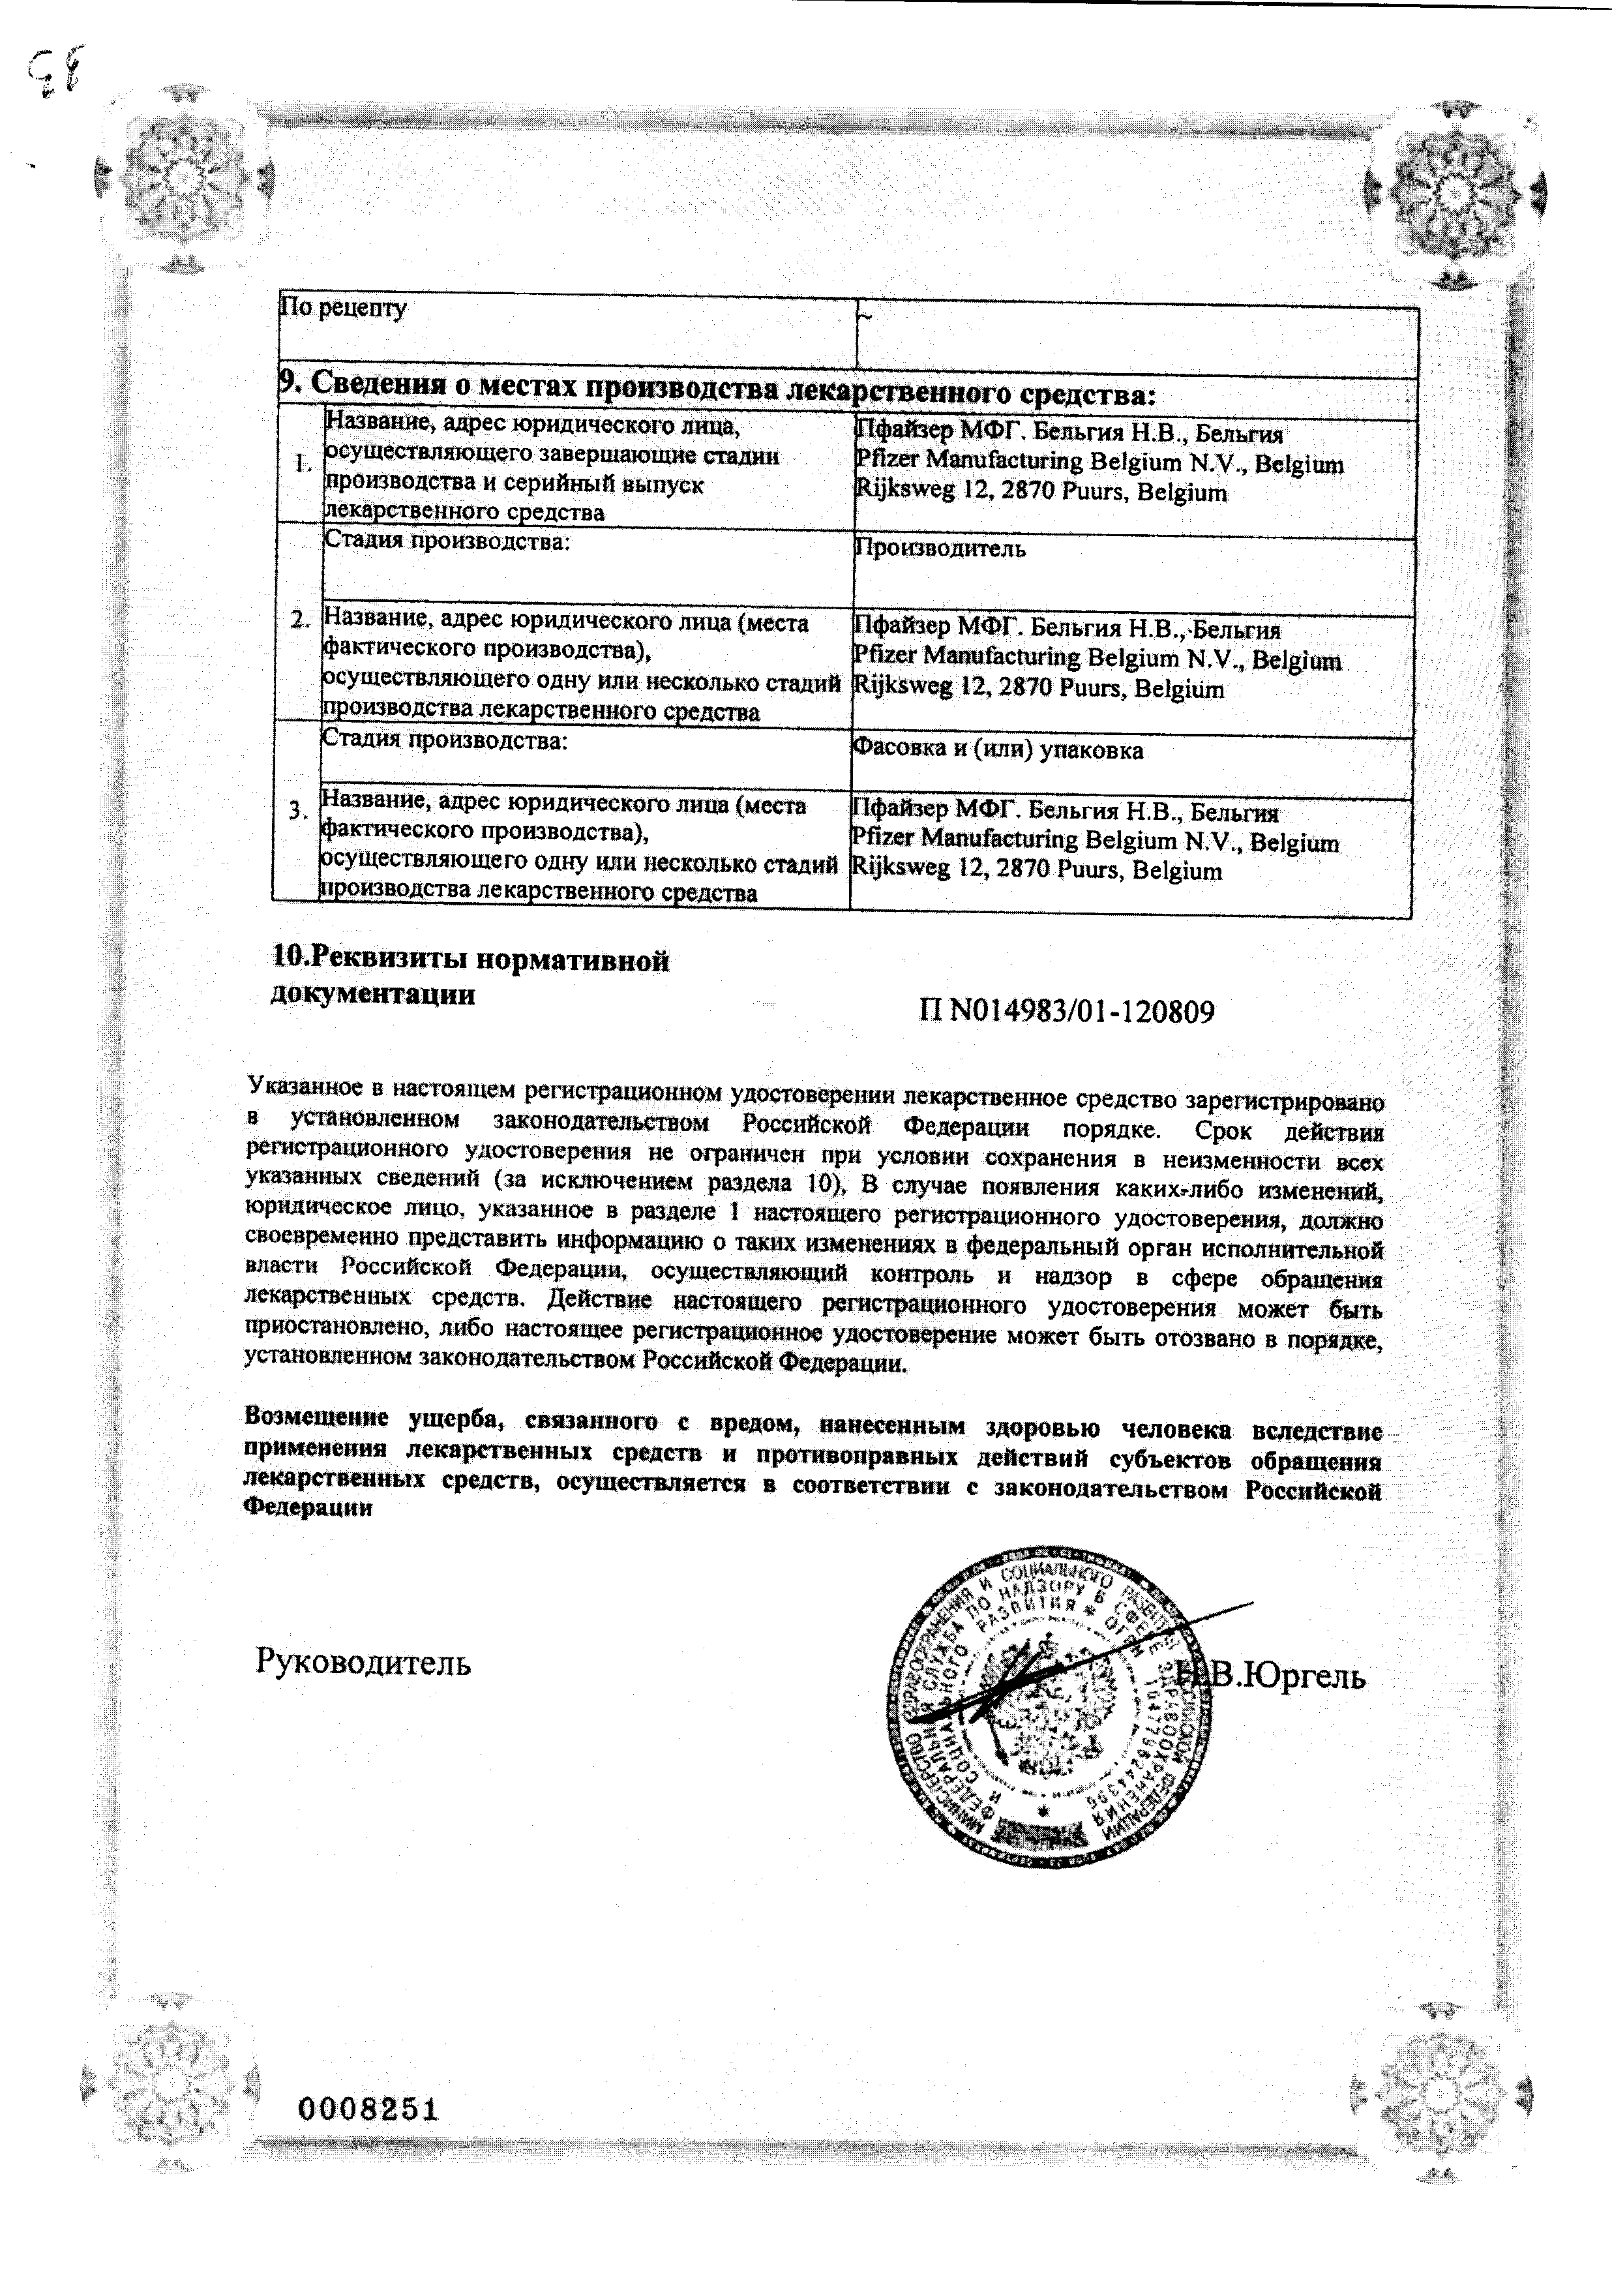 Солу-Медрол сертификат